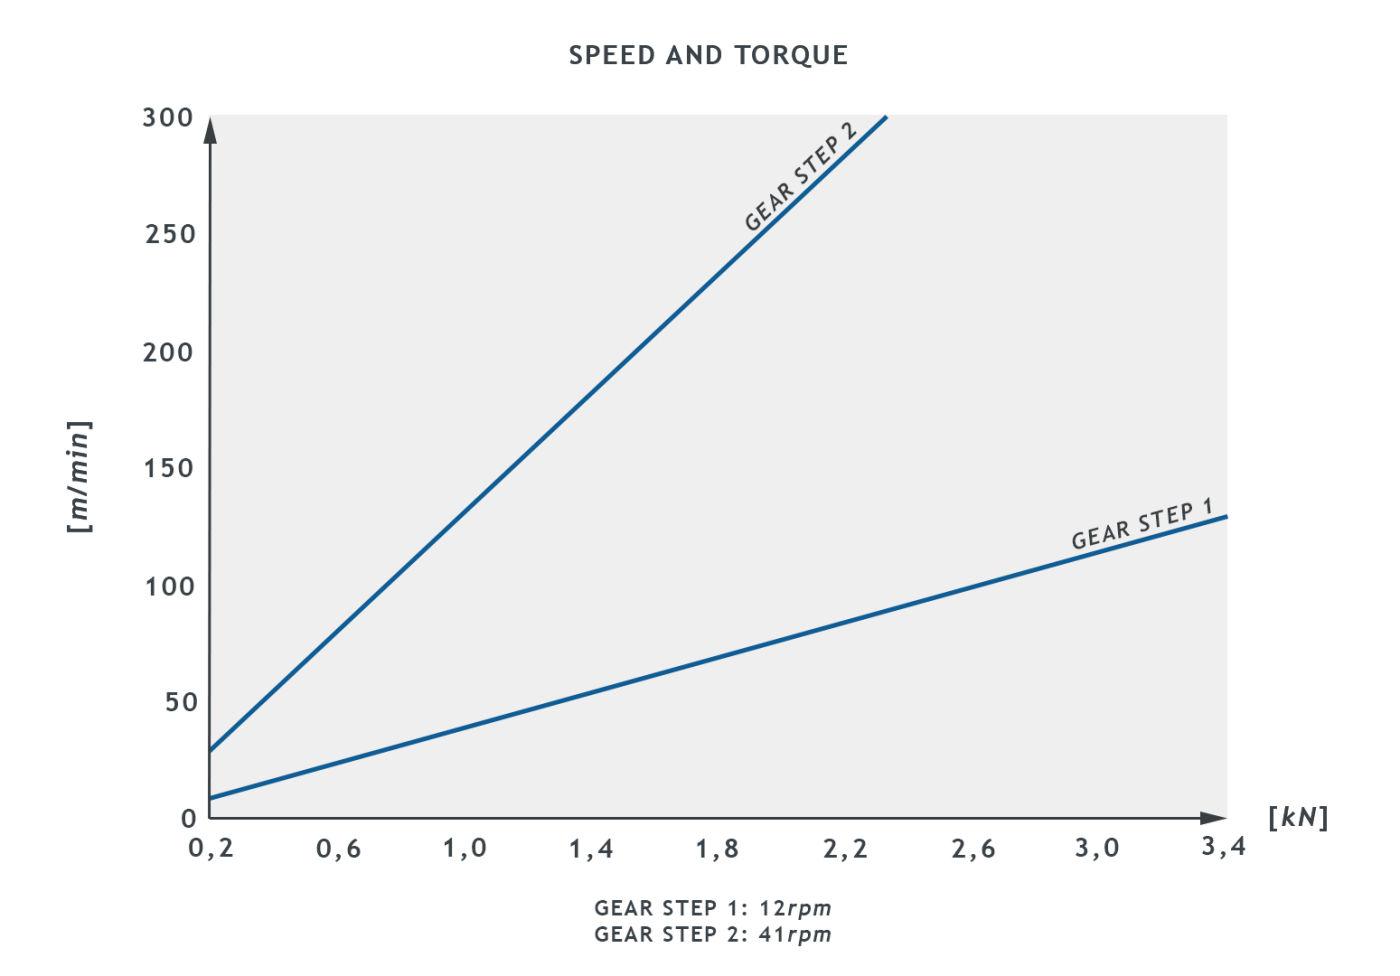 TUT10_SB0414003_SpeedTorque_graph1.jpg